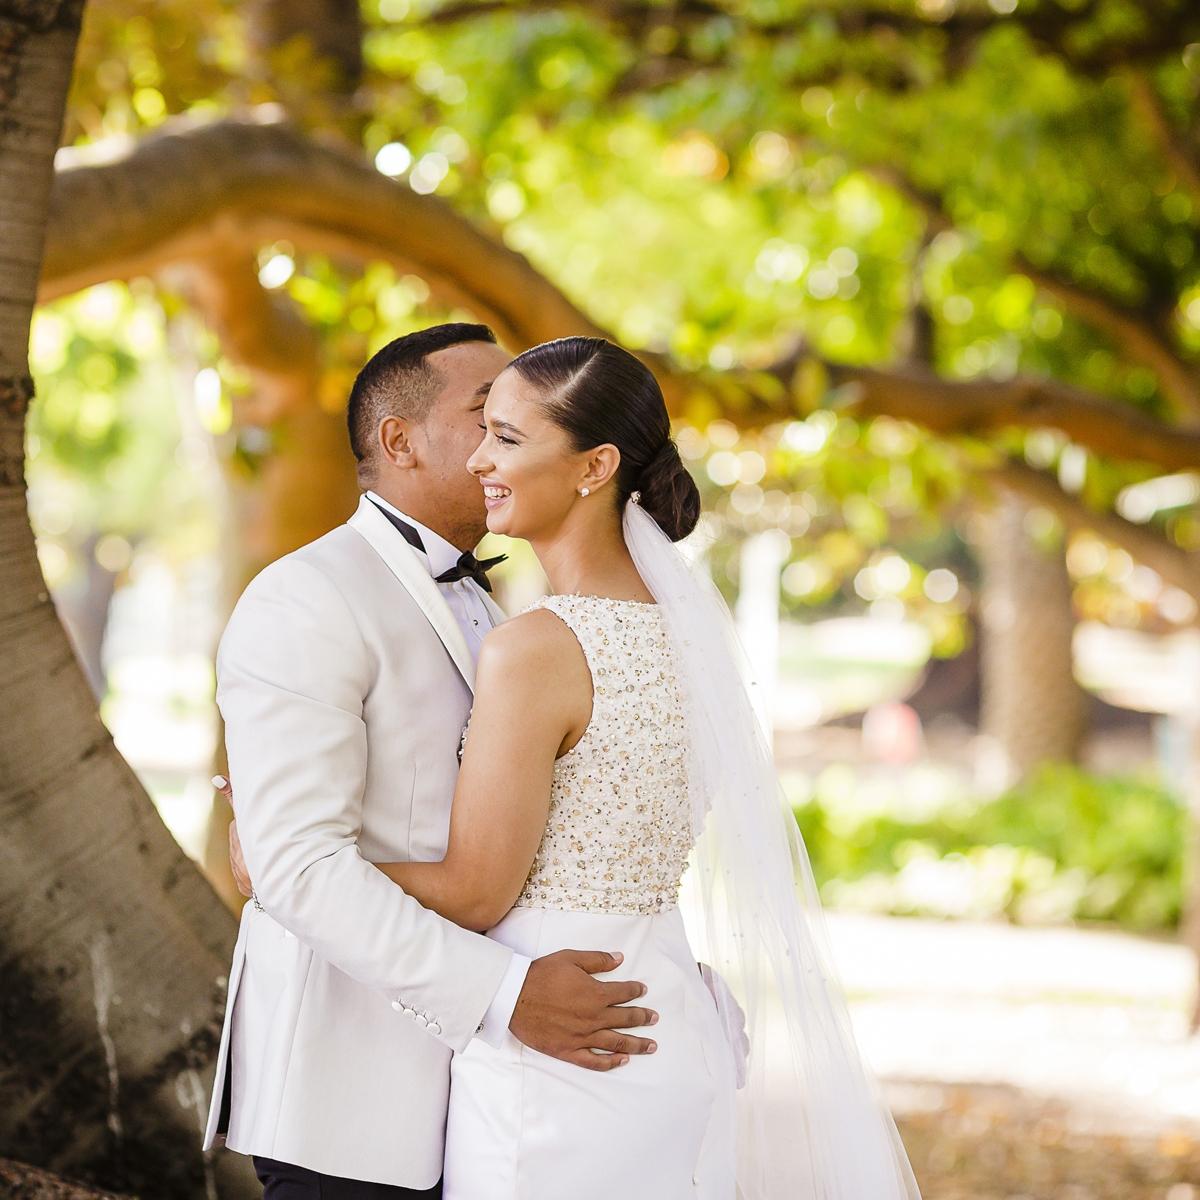 wedding Photographer Perth 81.jpg